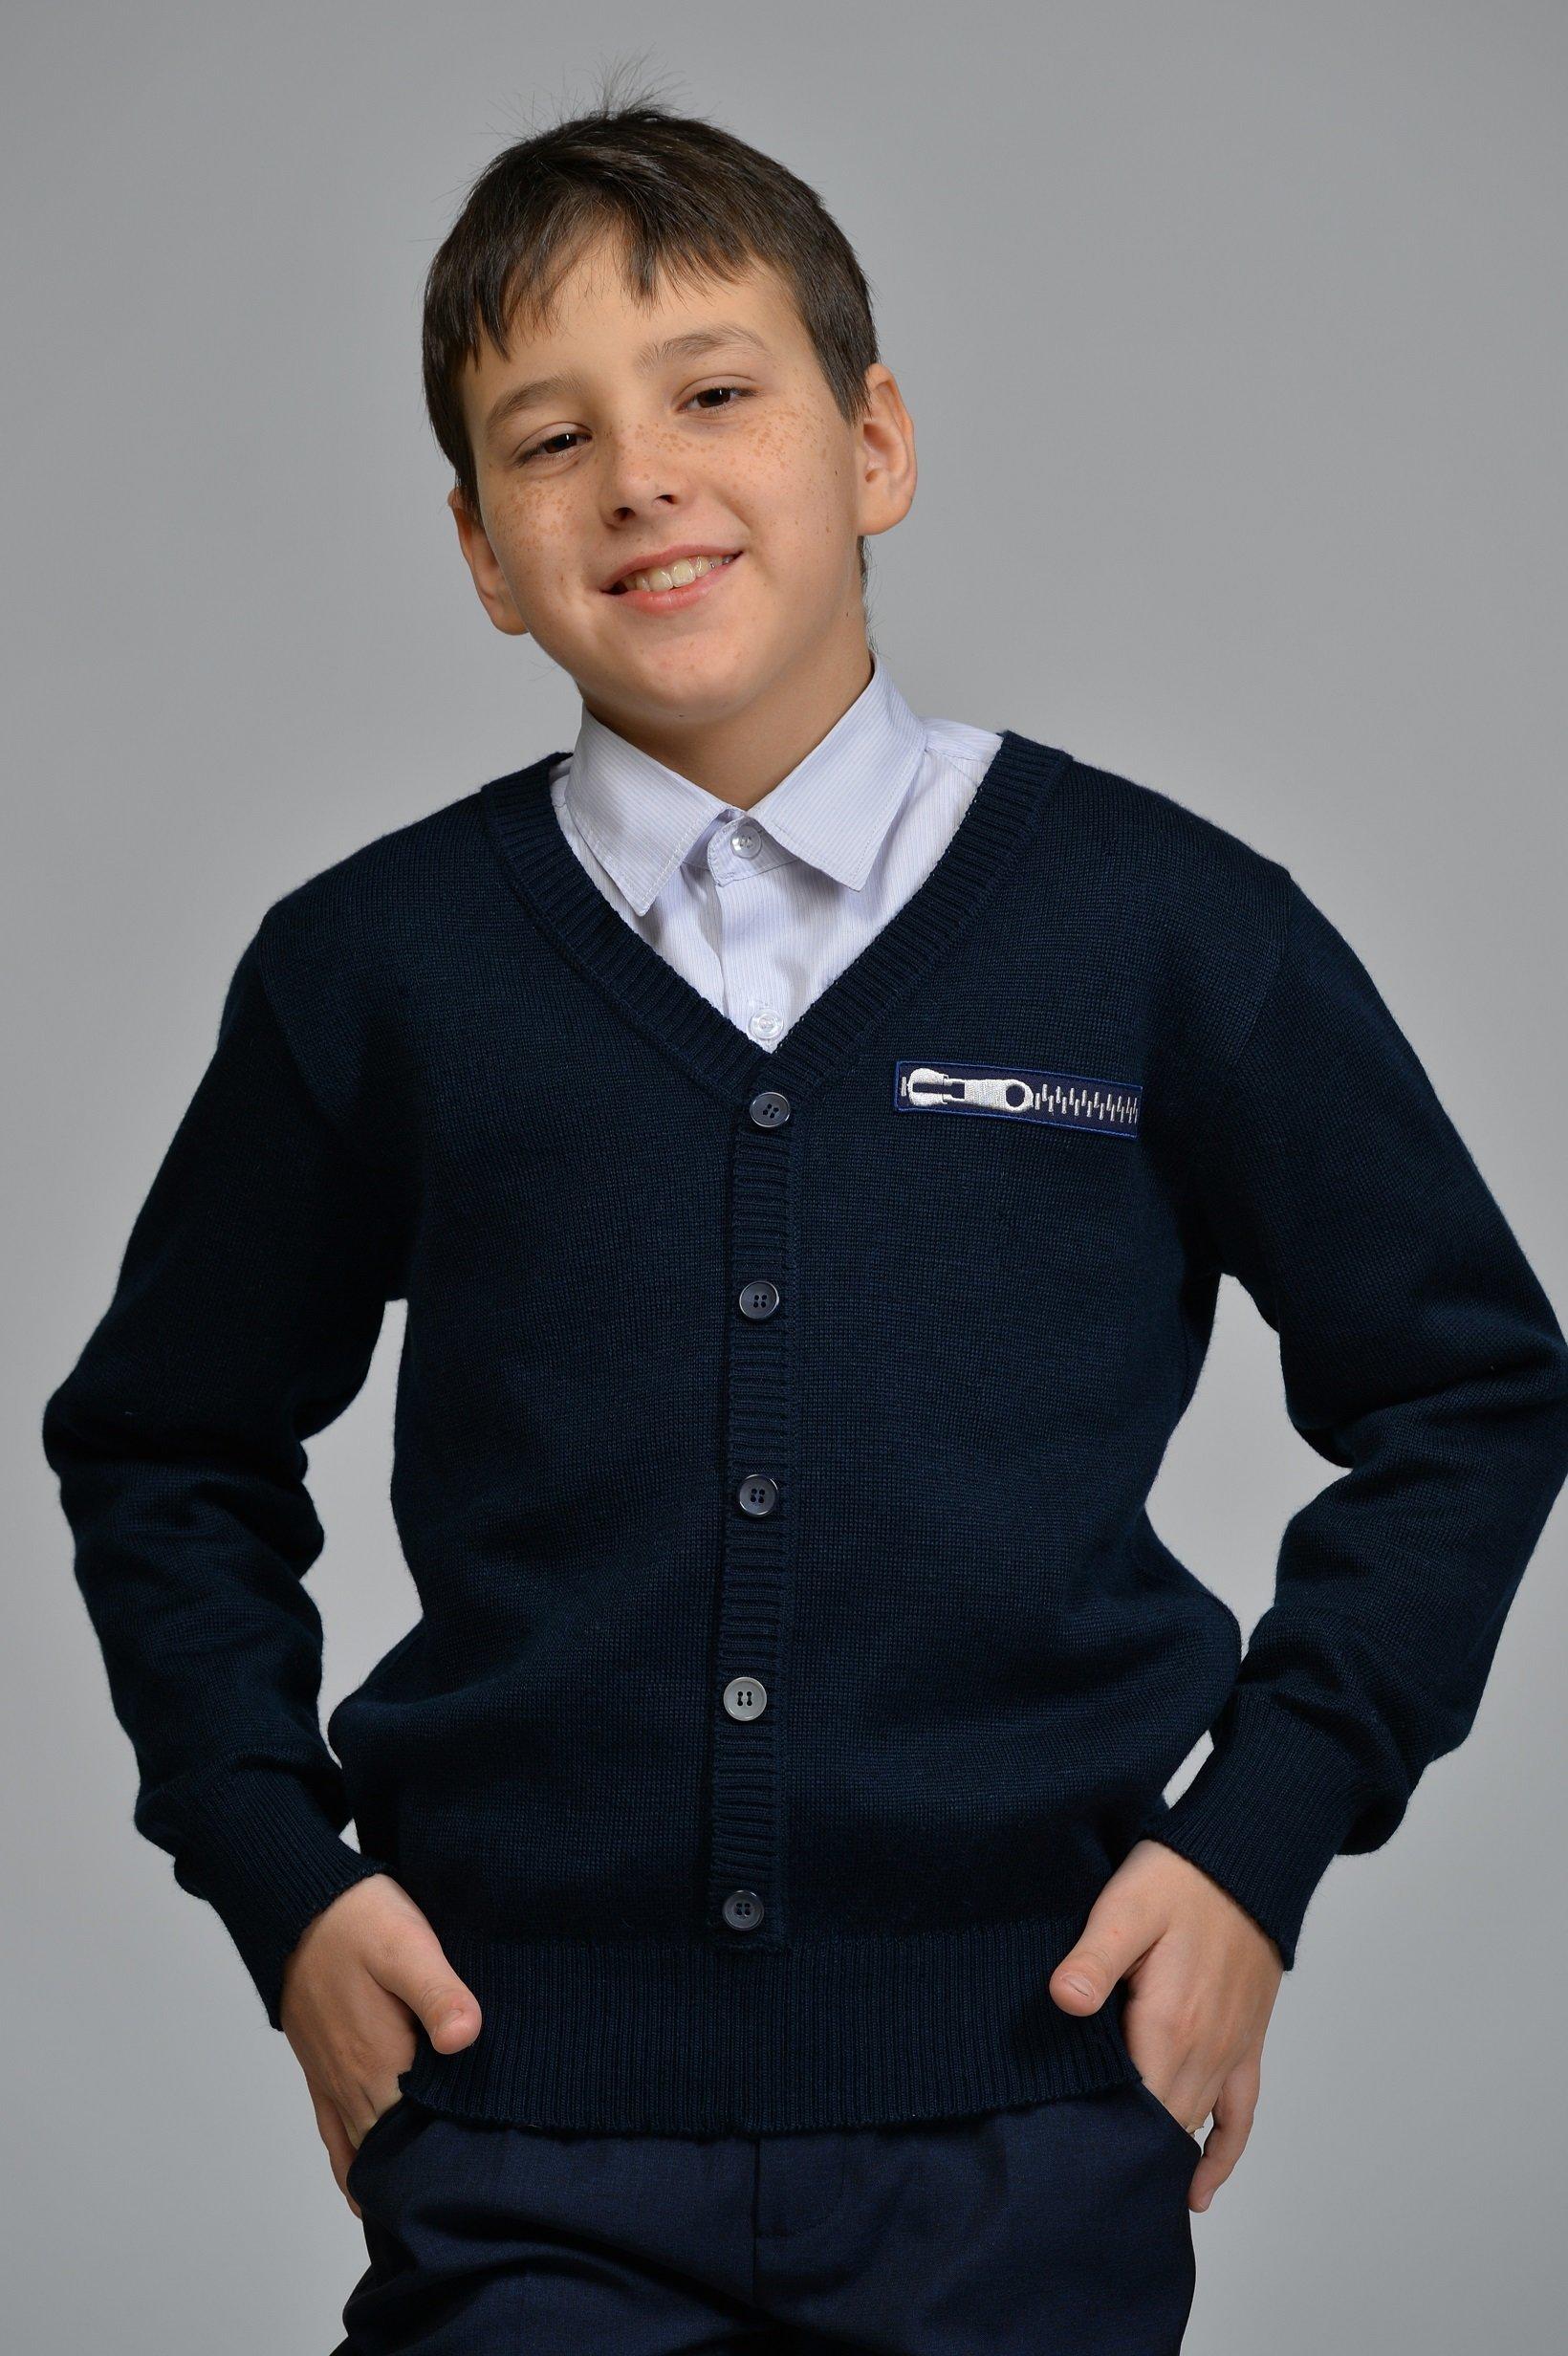 Пуловер для мальчика DSDT213чер